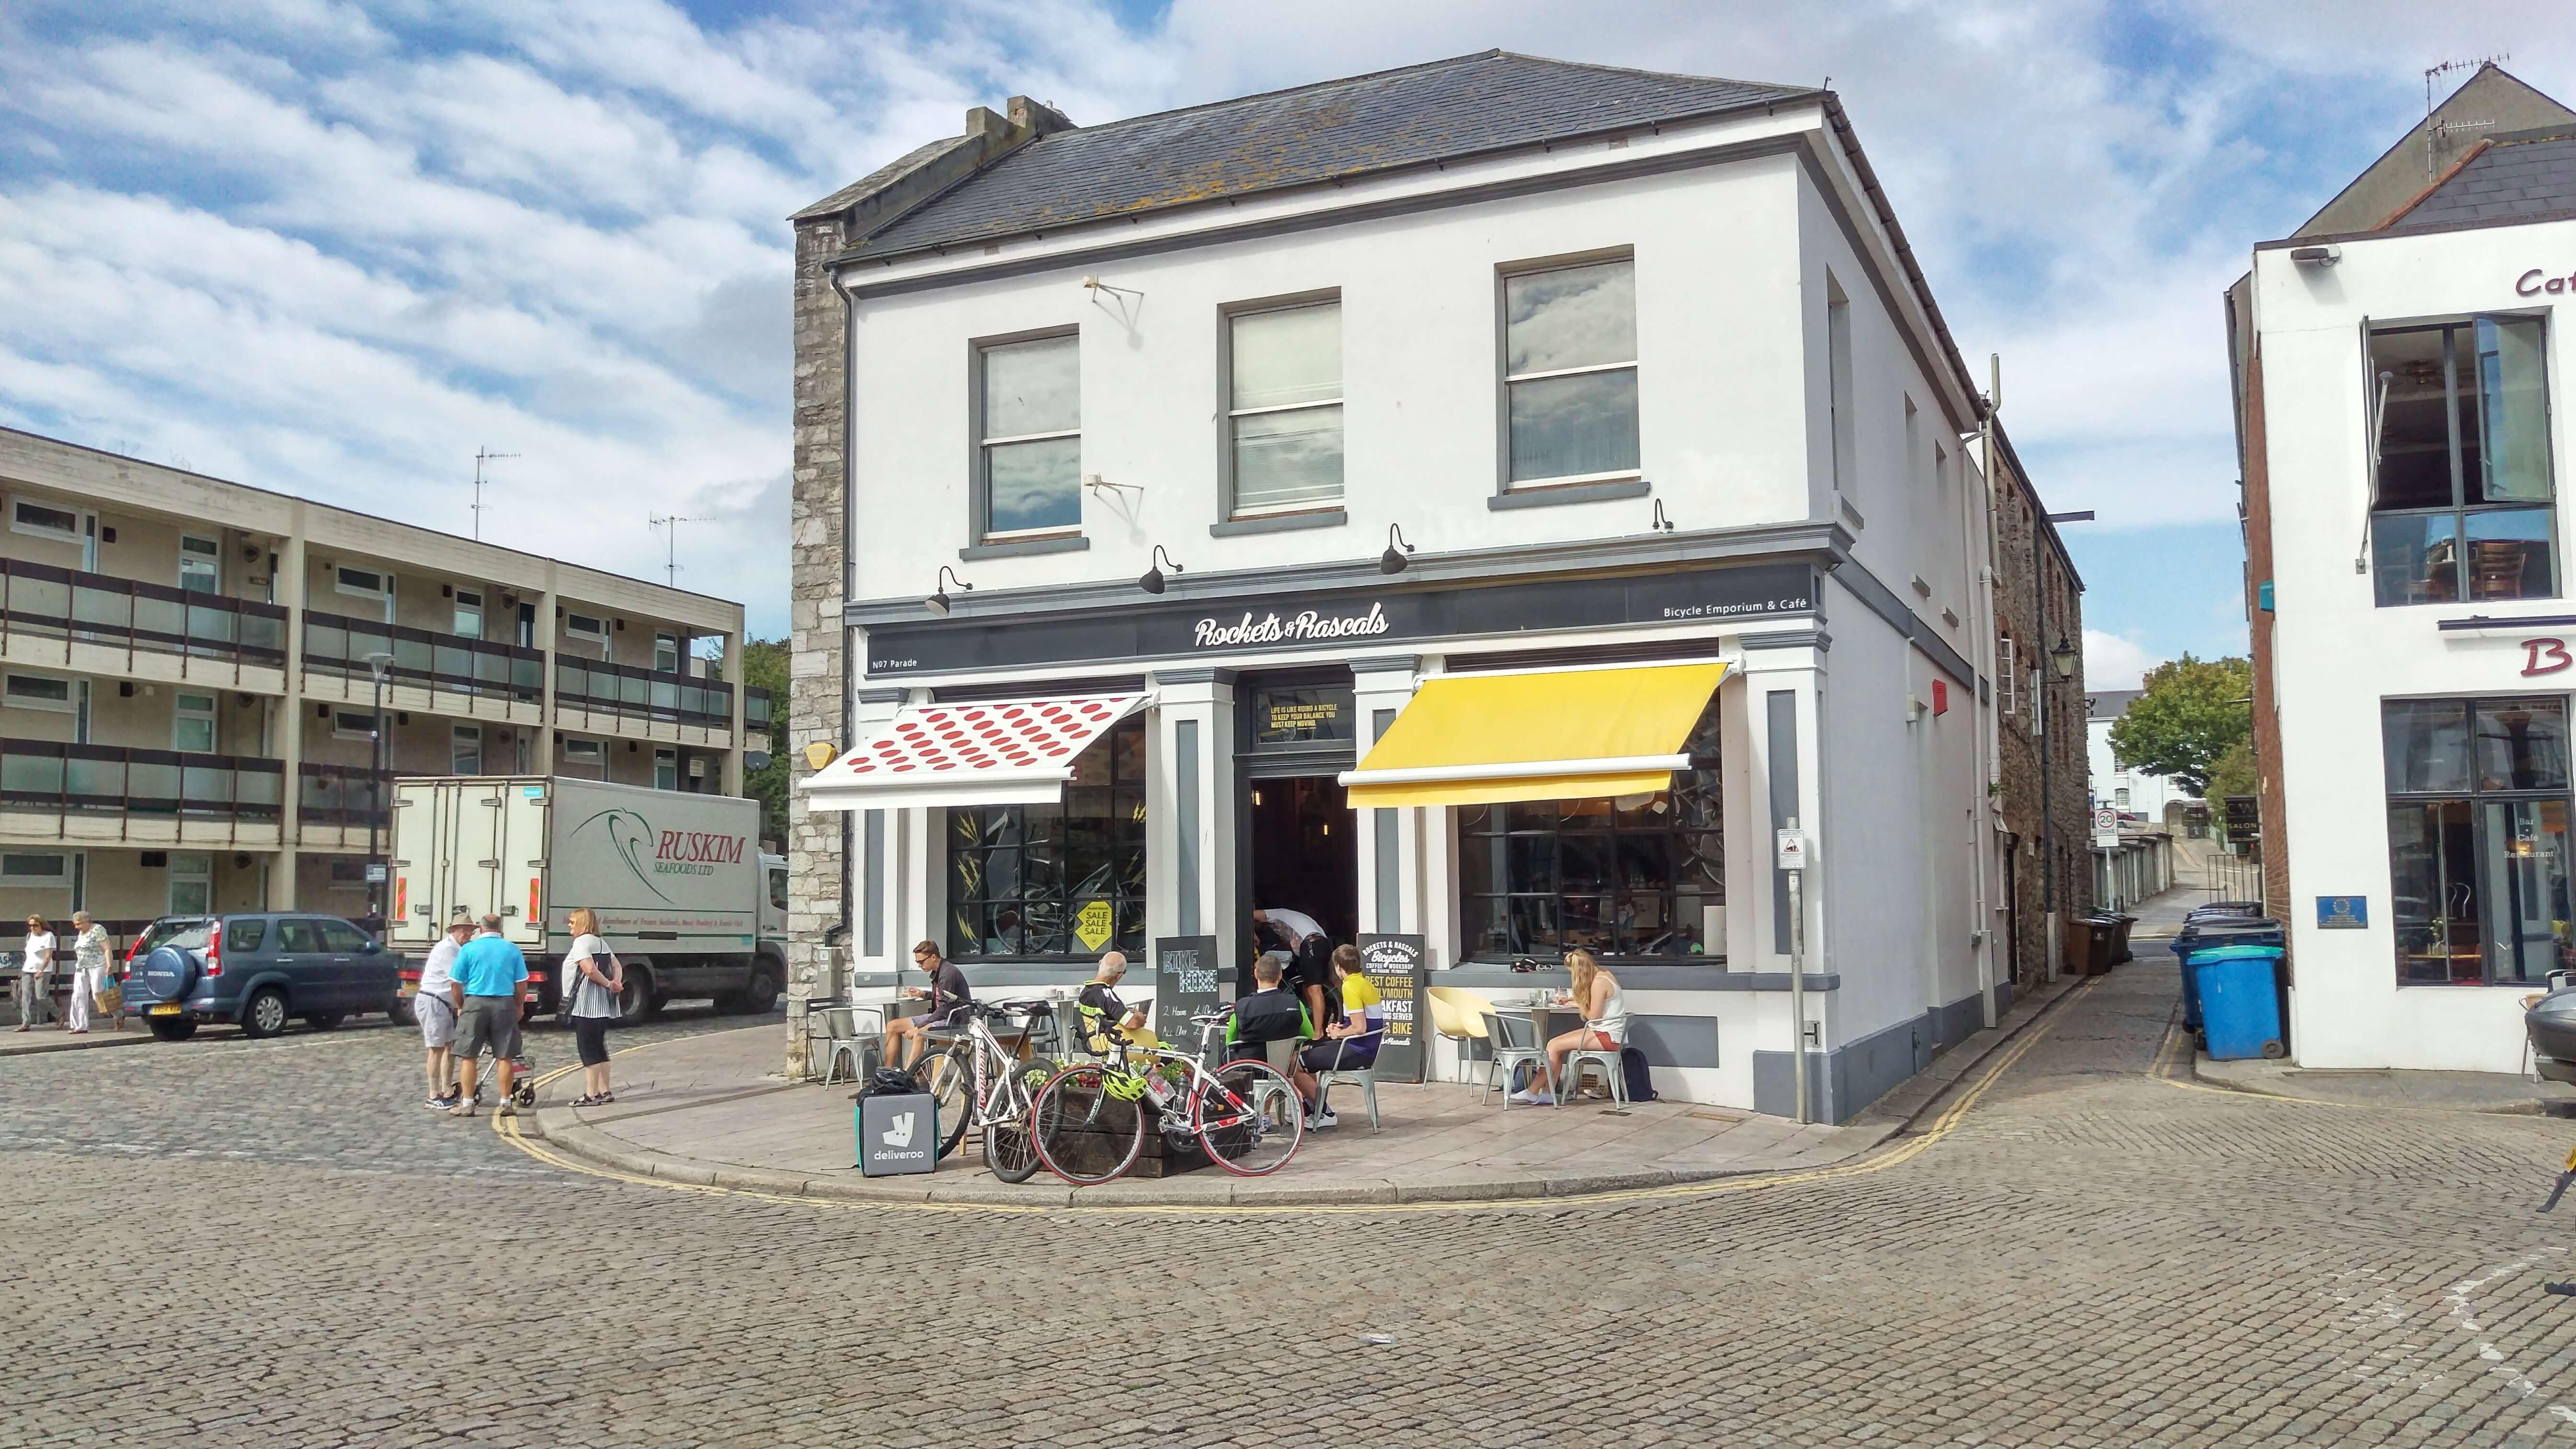 Cake Shop Plymouth Barbican